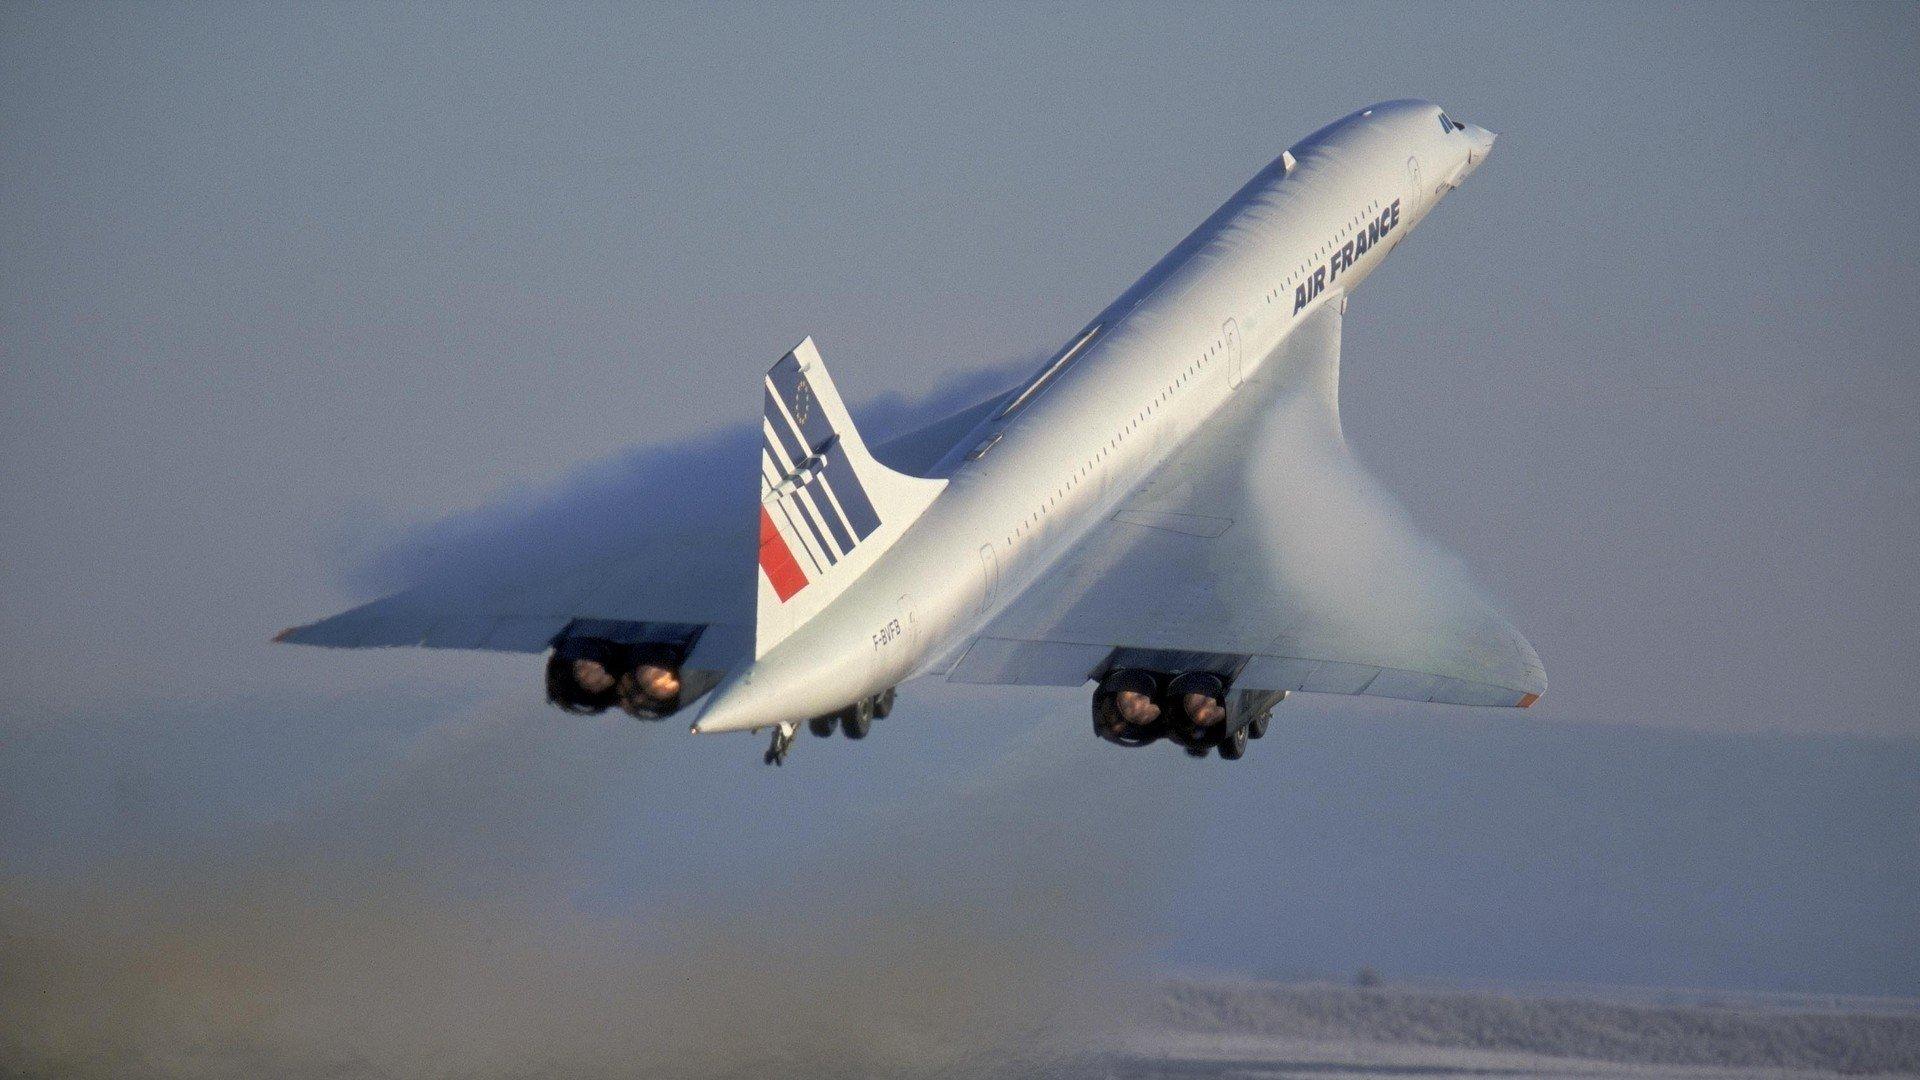 Concorde HD Wallpaper Background Image 1920x1080 ID454537 1920x1080